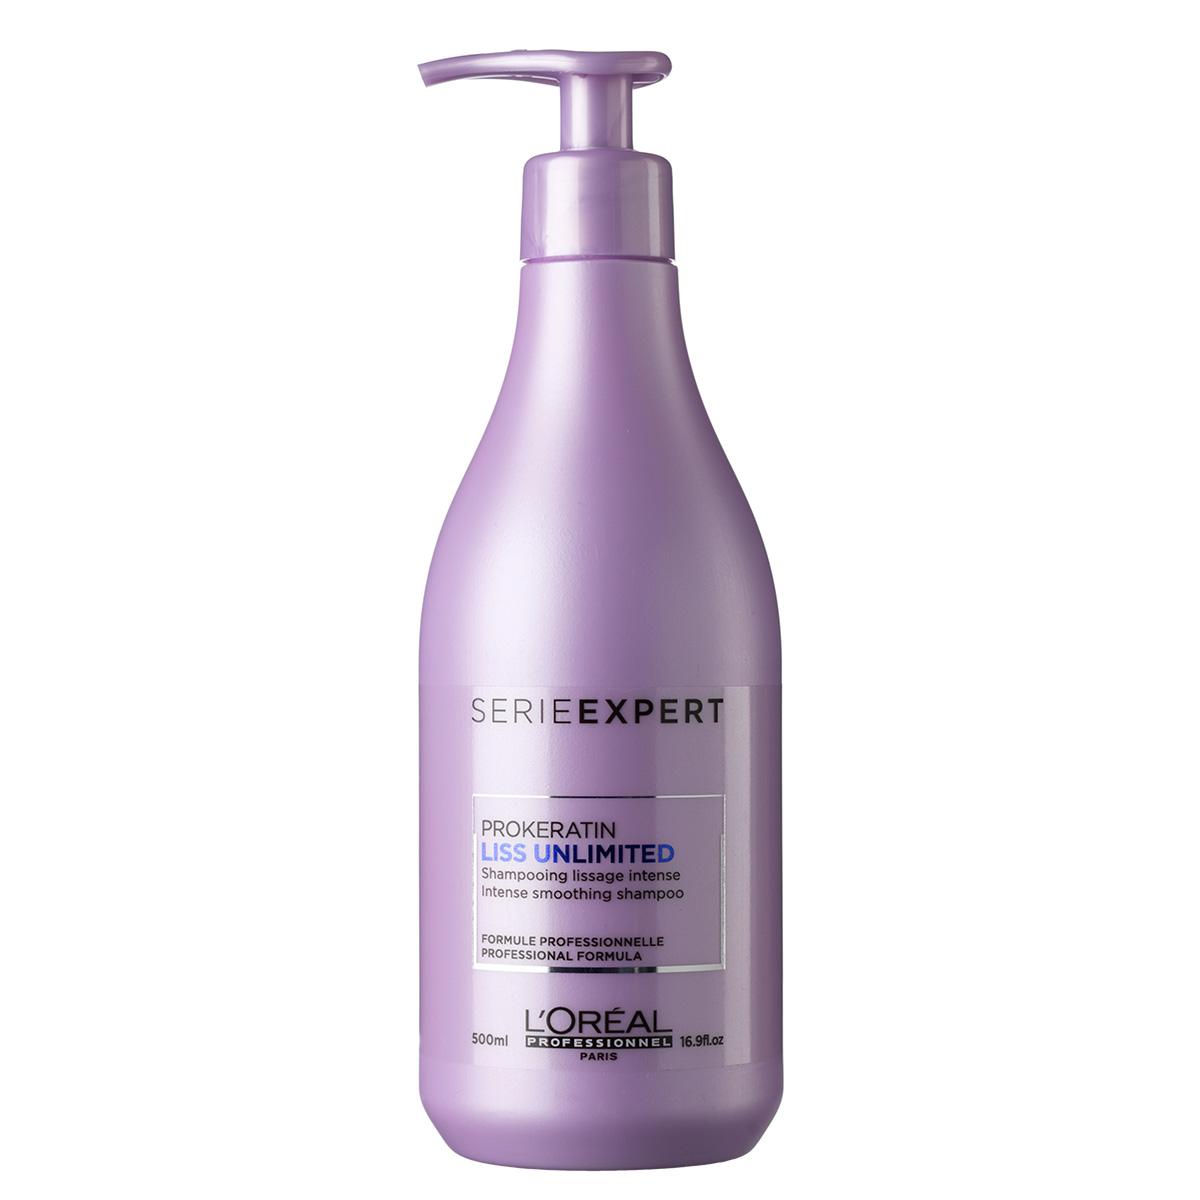 Billede af LOréal Série expert Liss Unlimited Prokeratin Shampoo - 500 ml